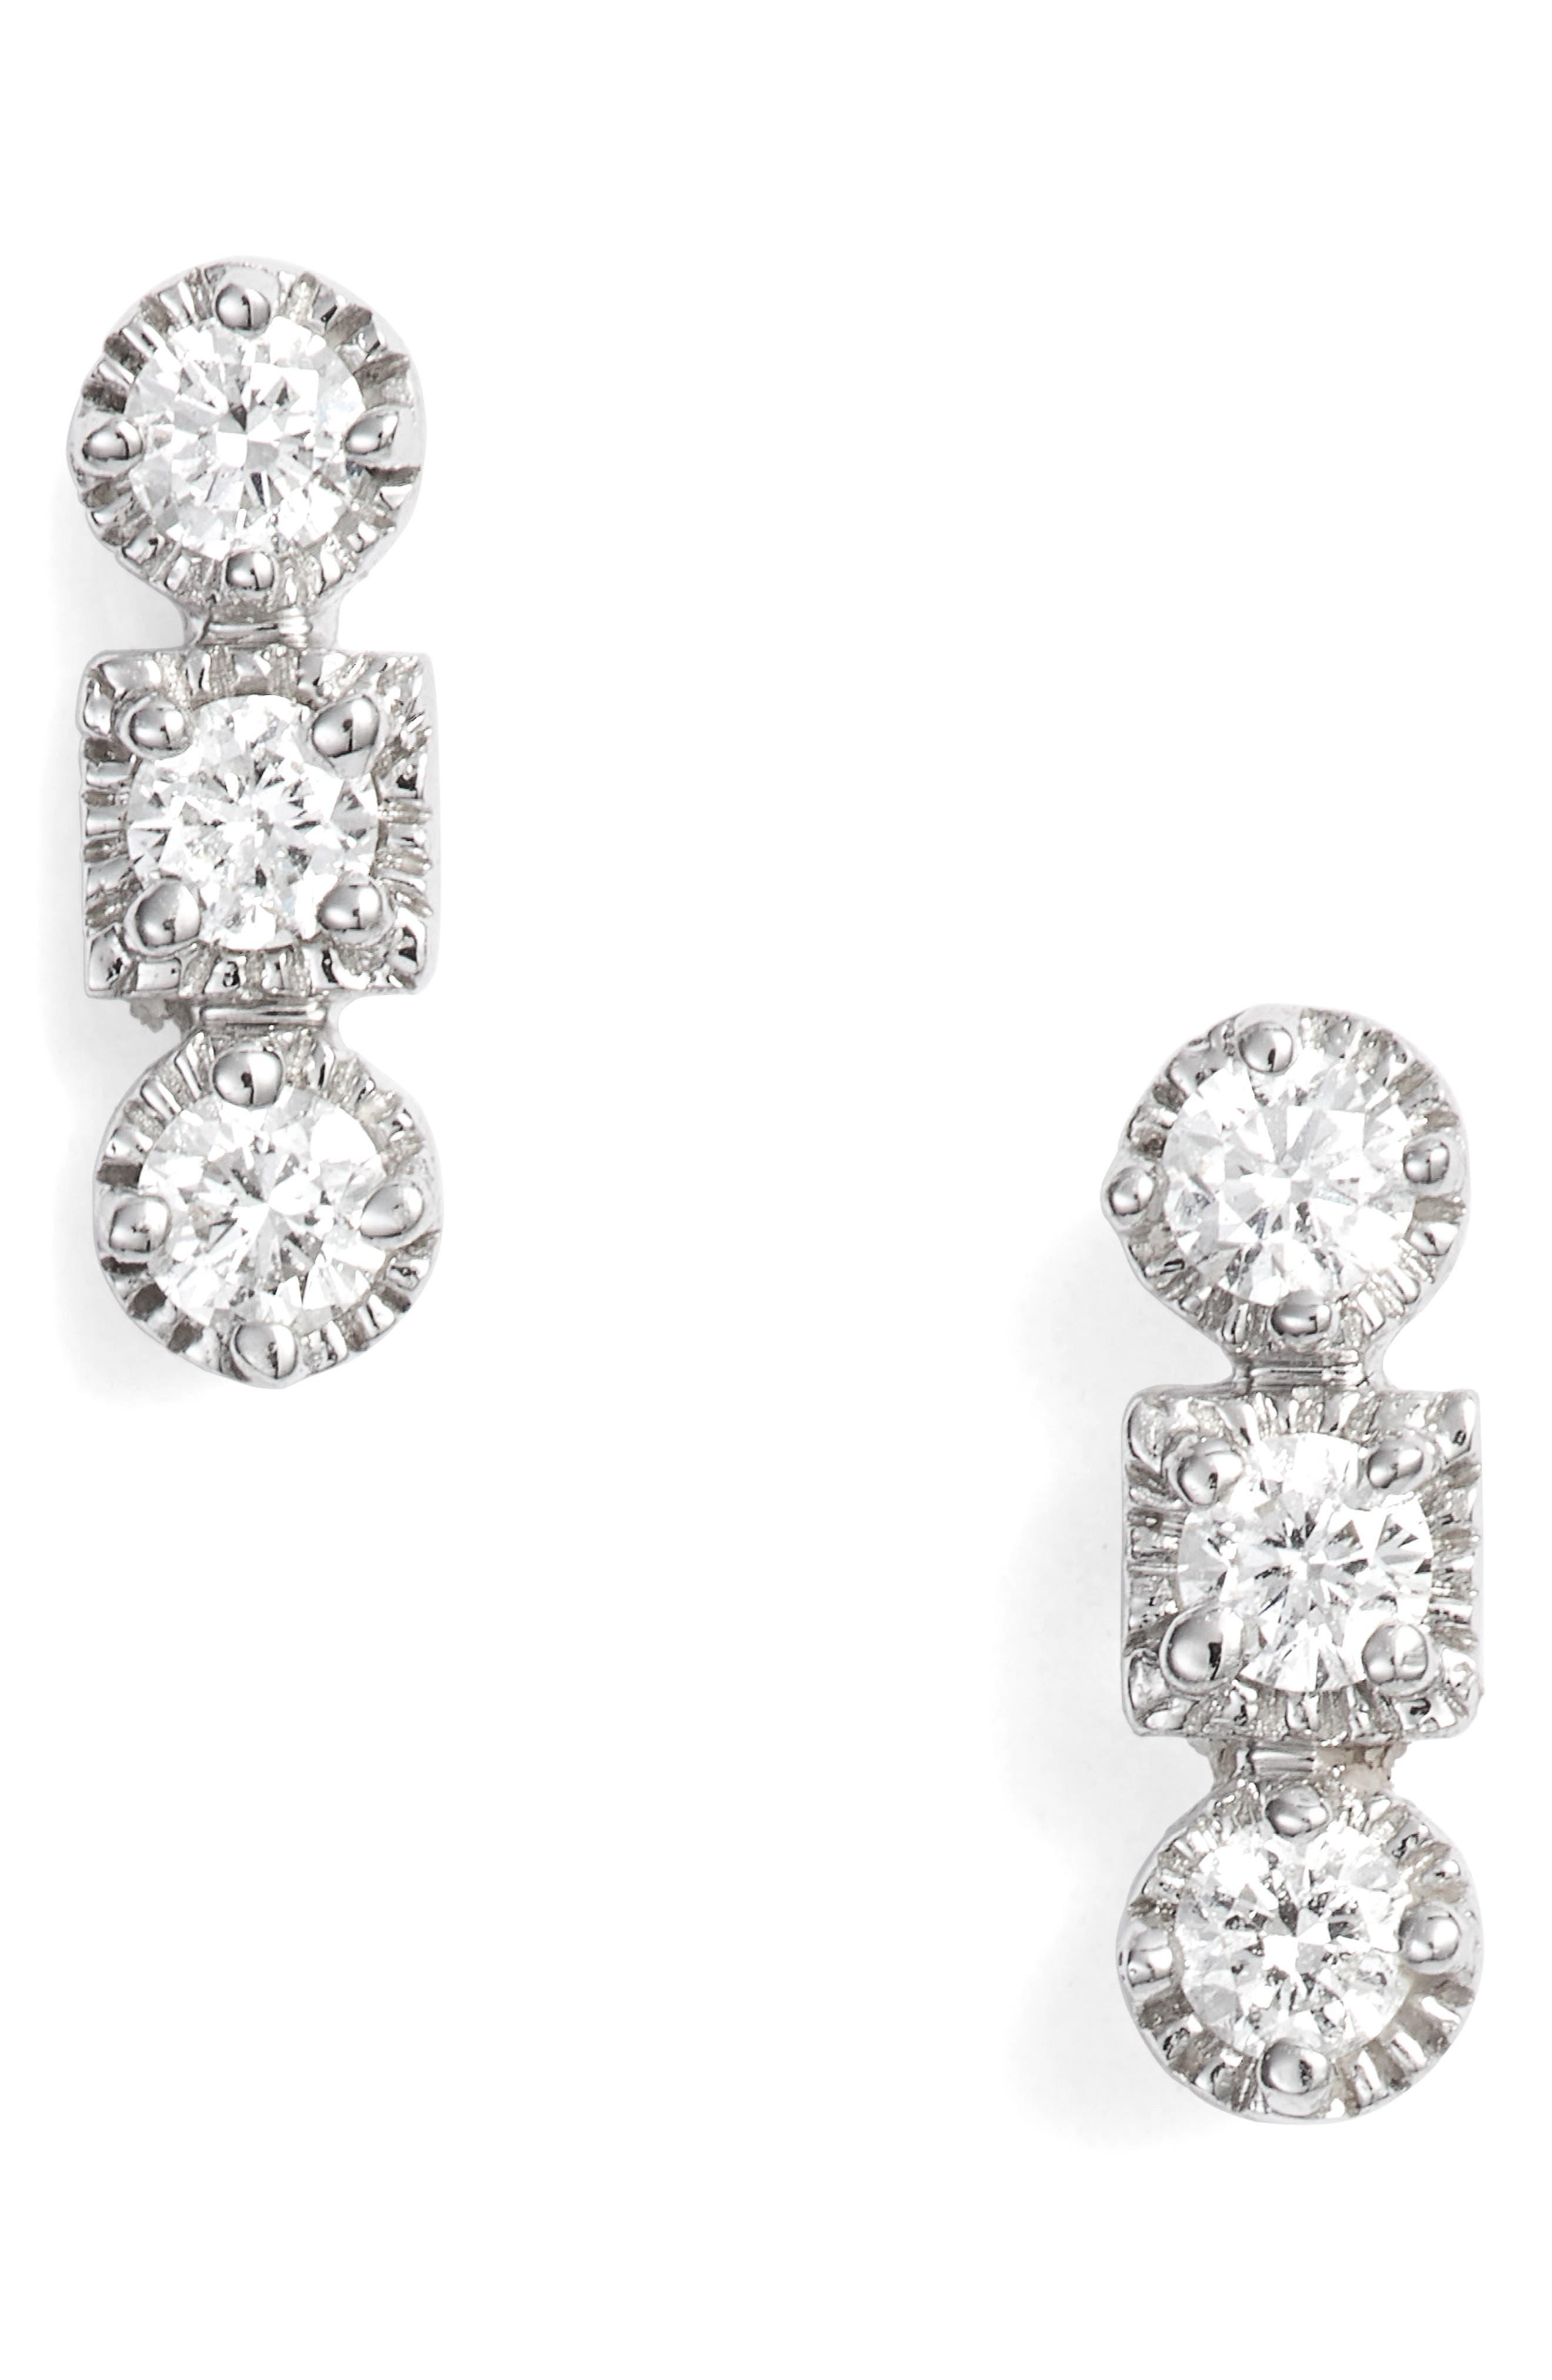 Maya 3-Stone Stud Earrings,                         Main,                         color, WHITE GOLD/ DIAMOND